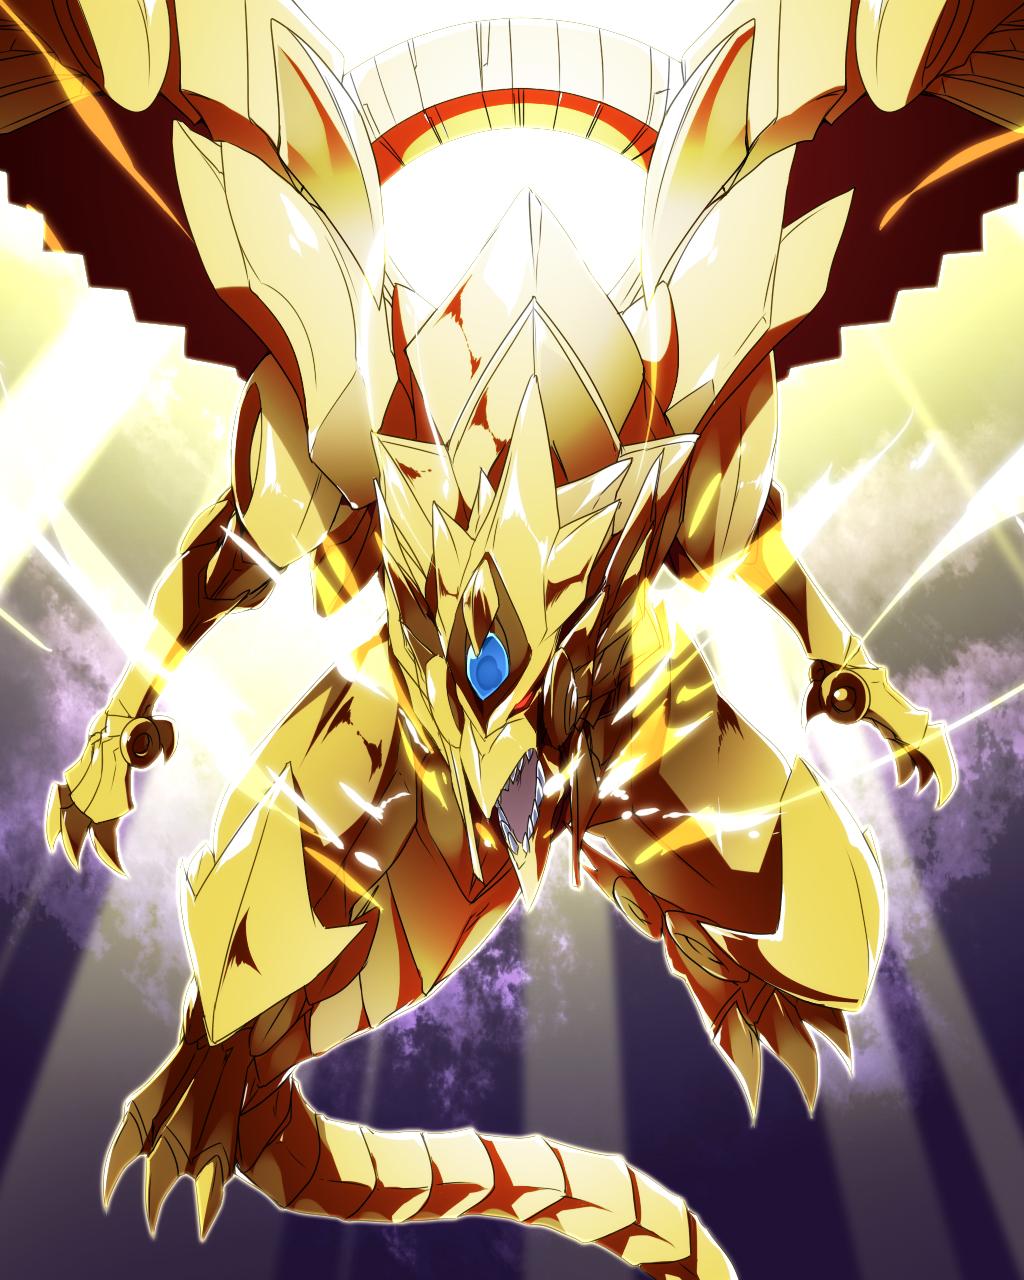 Yu Gi Oh Dioses Egipcios Wallpaper the winged dragon of ra - yu-gi-oh! duel monsters - zerochan anime